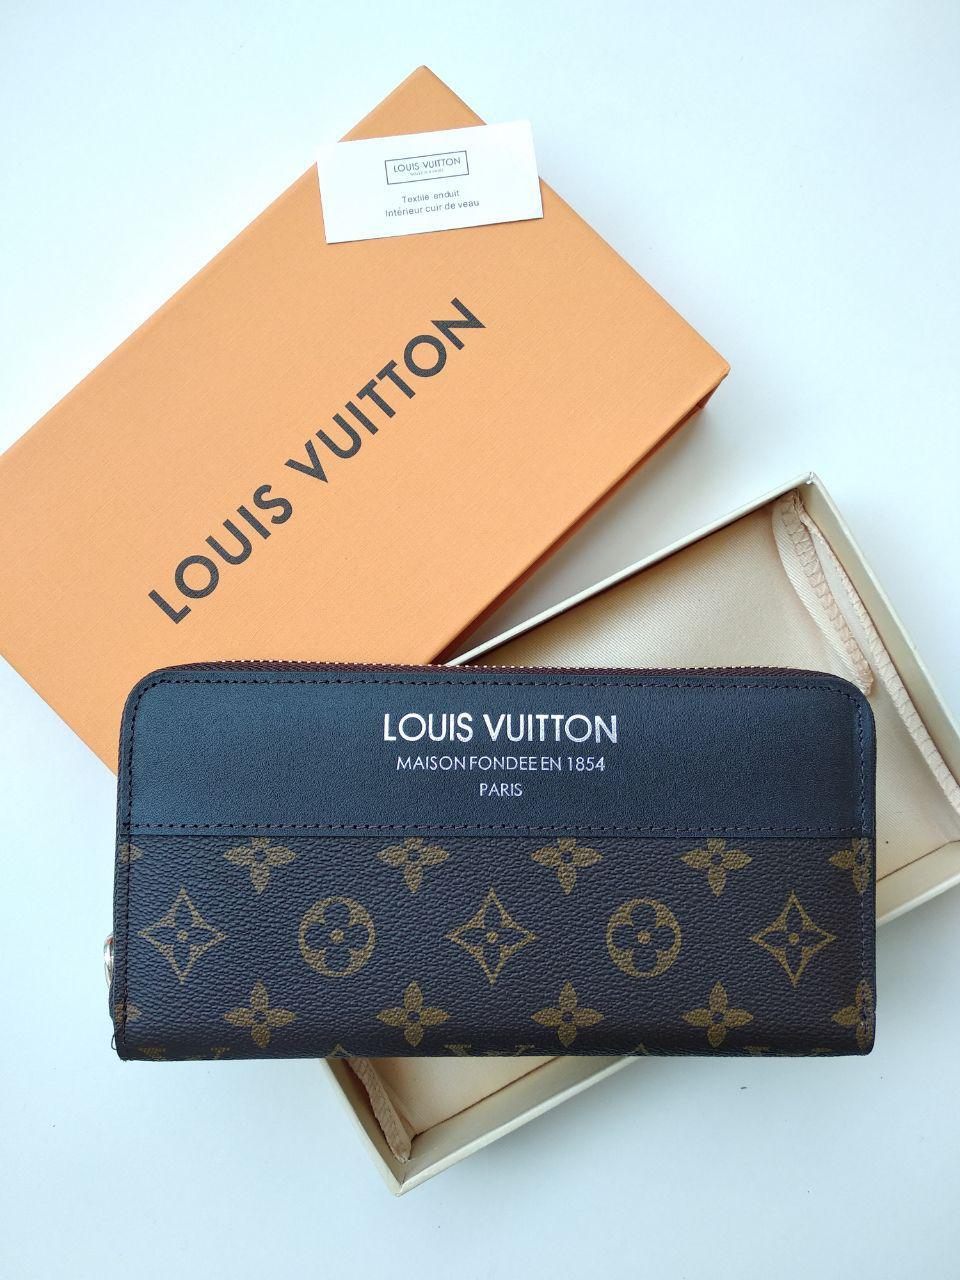 Кошелек Louis Vuitton, кожа, монограмм